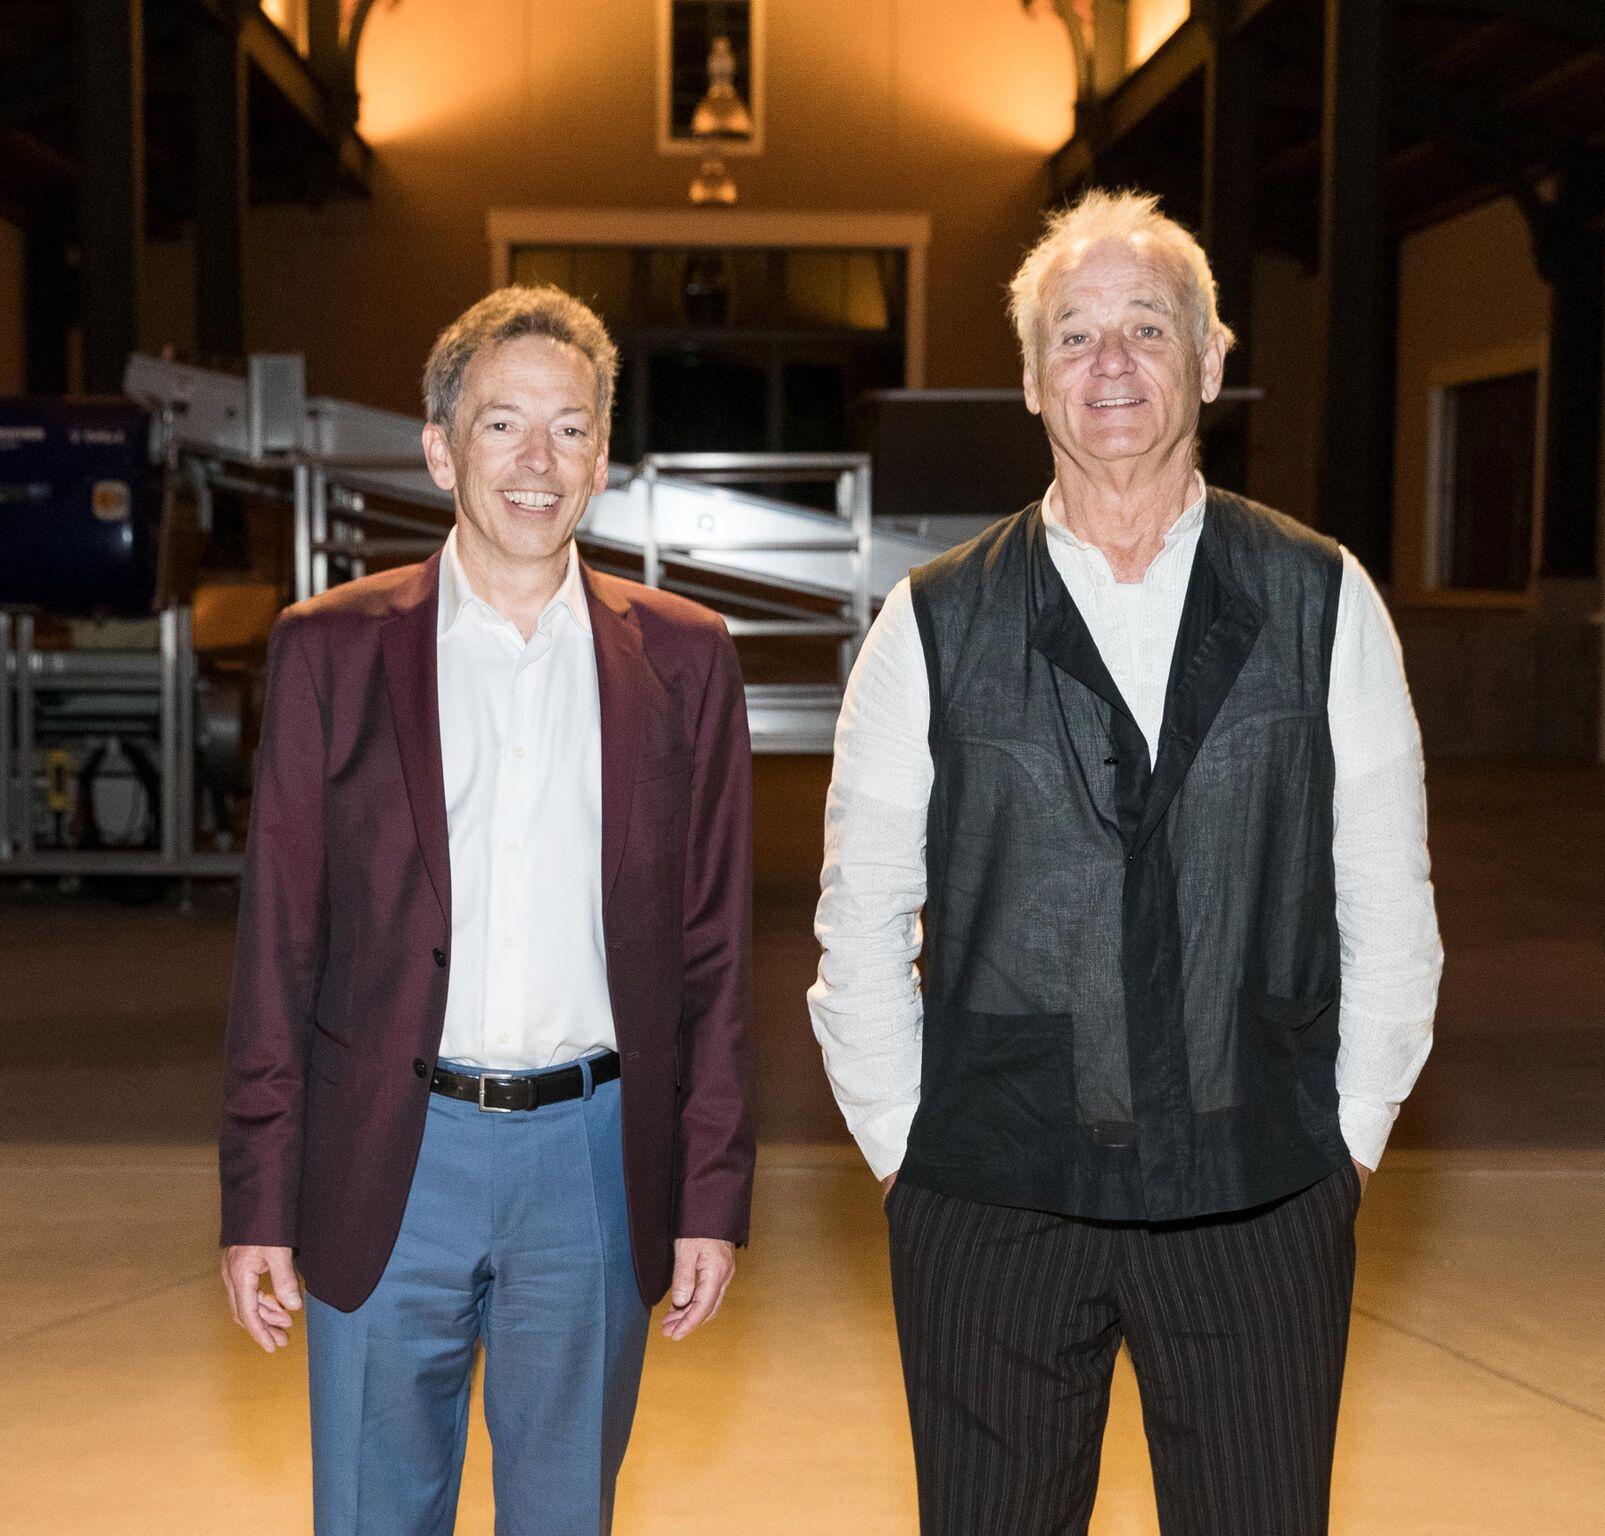 Festival founder Rick Walker and Bill Murray